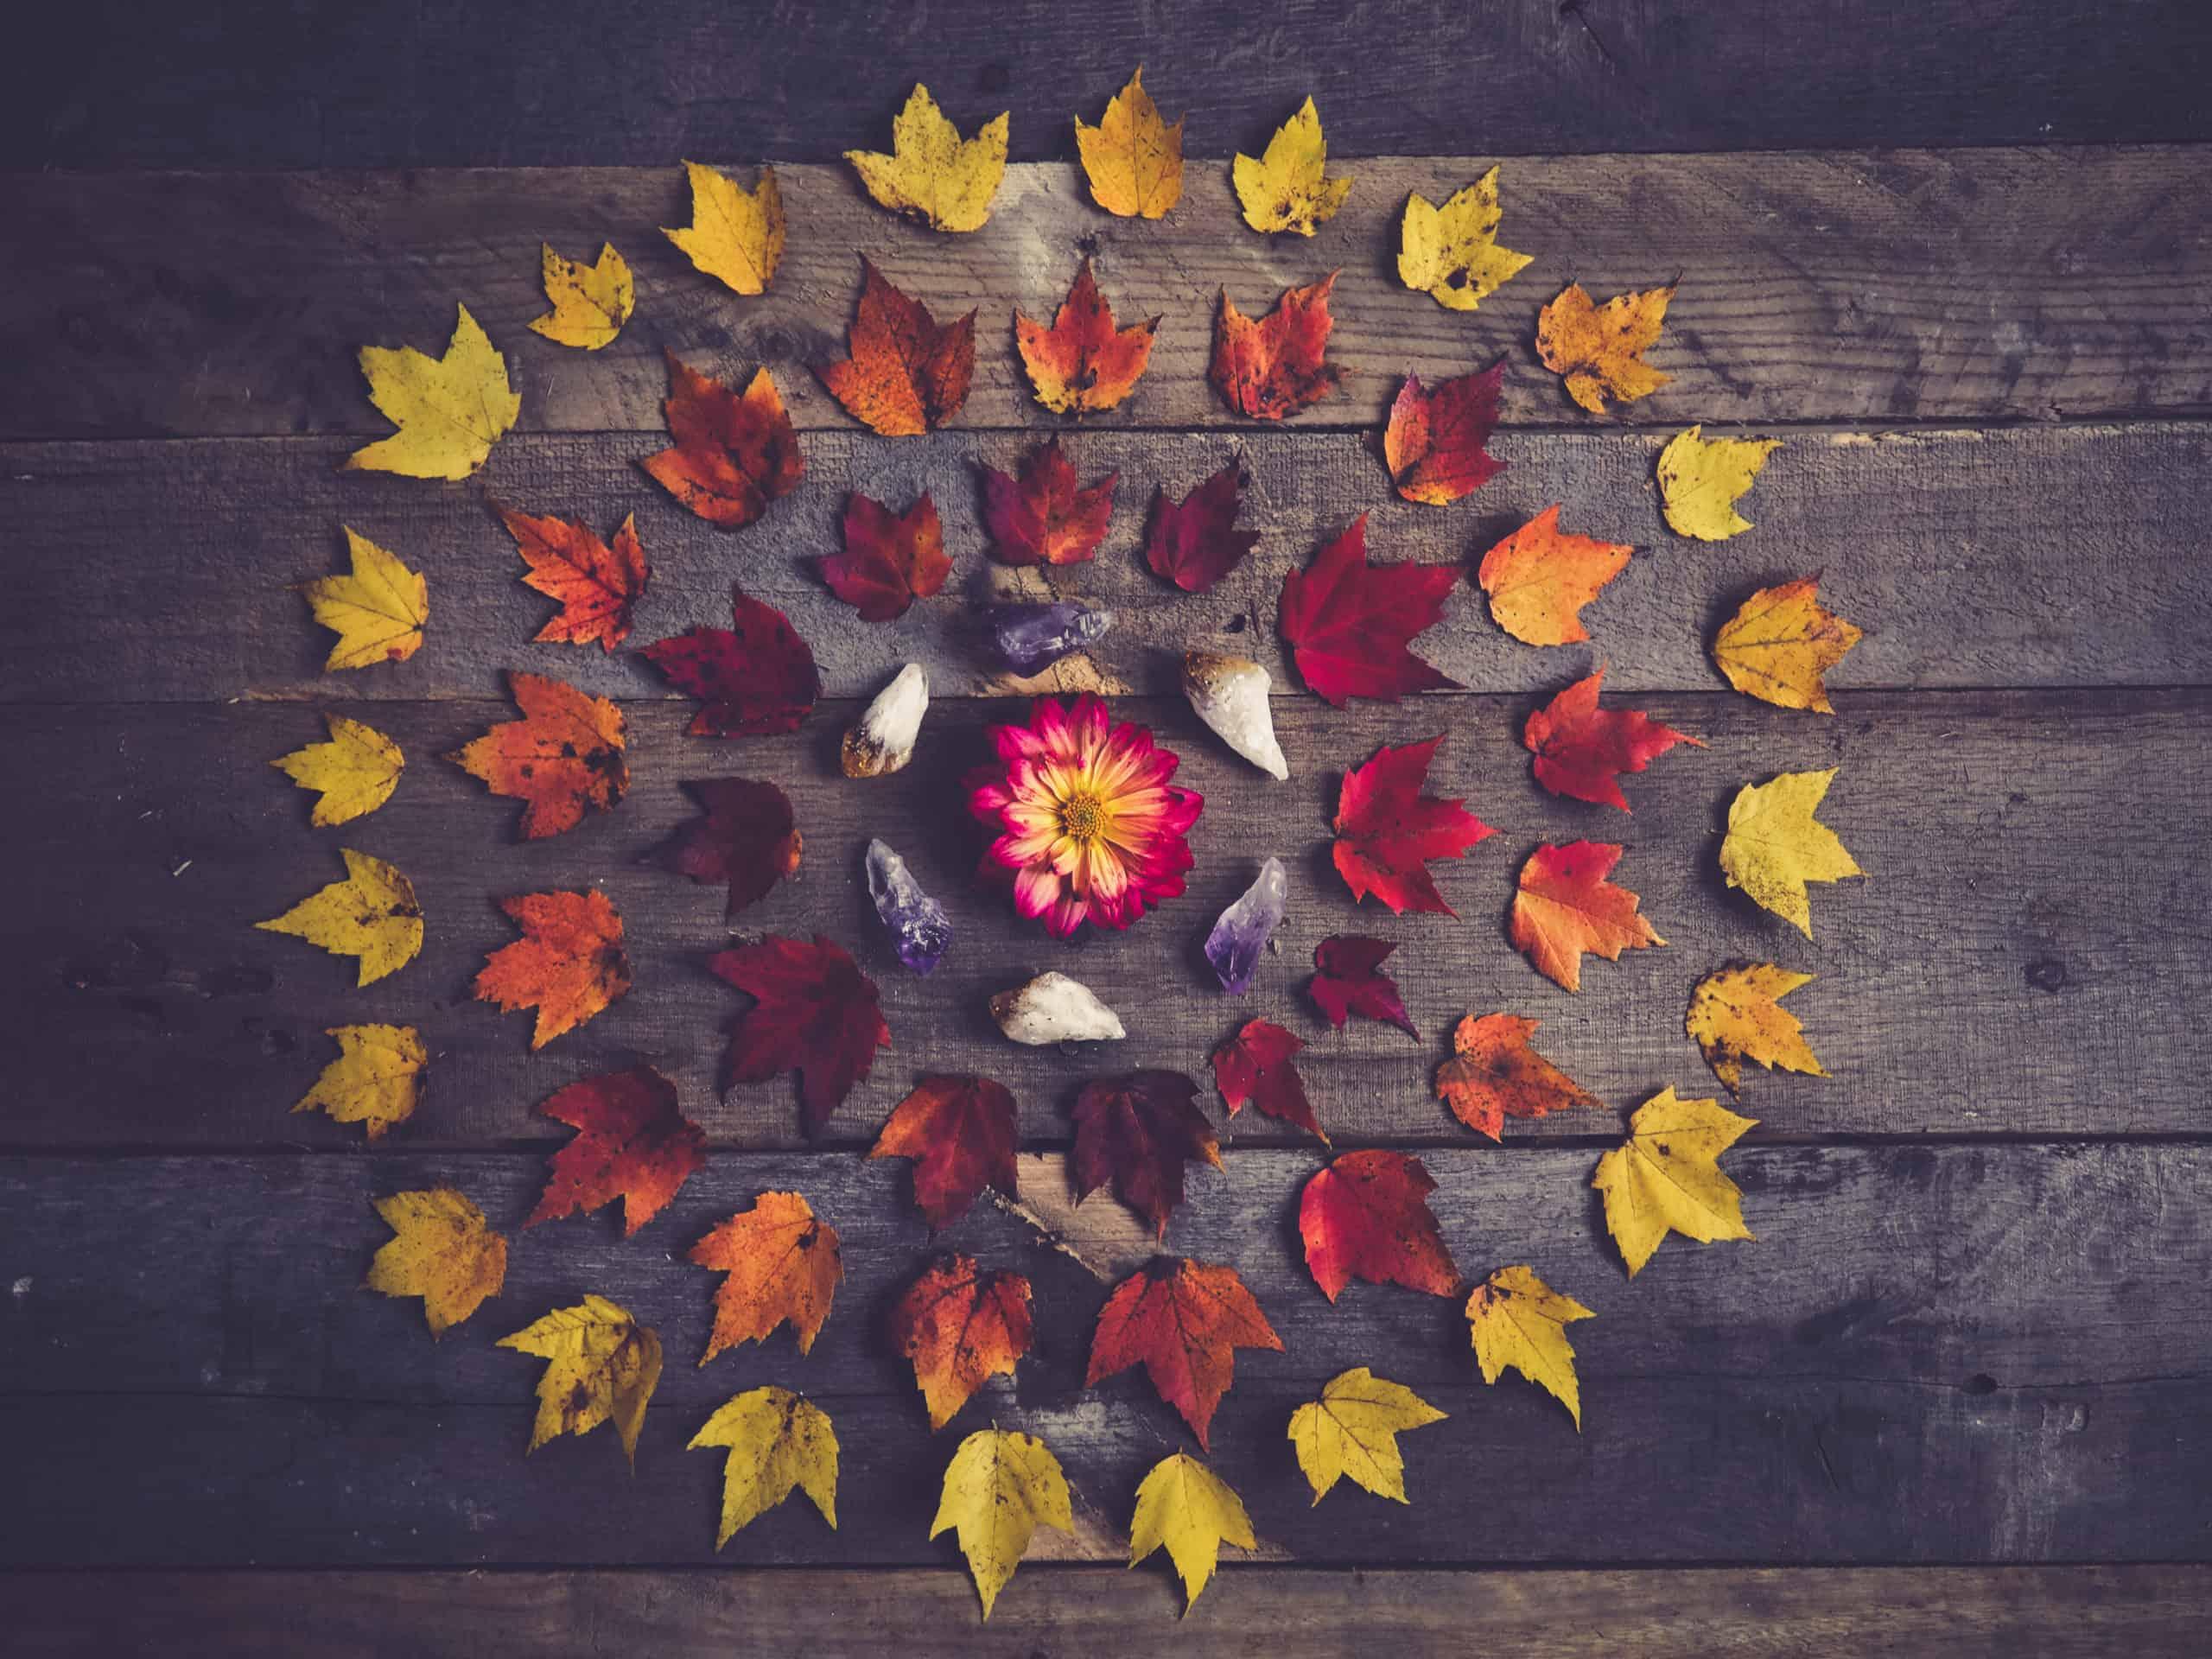 Creating Earth Altars and Mandalas for Ritual and Prayer